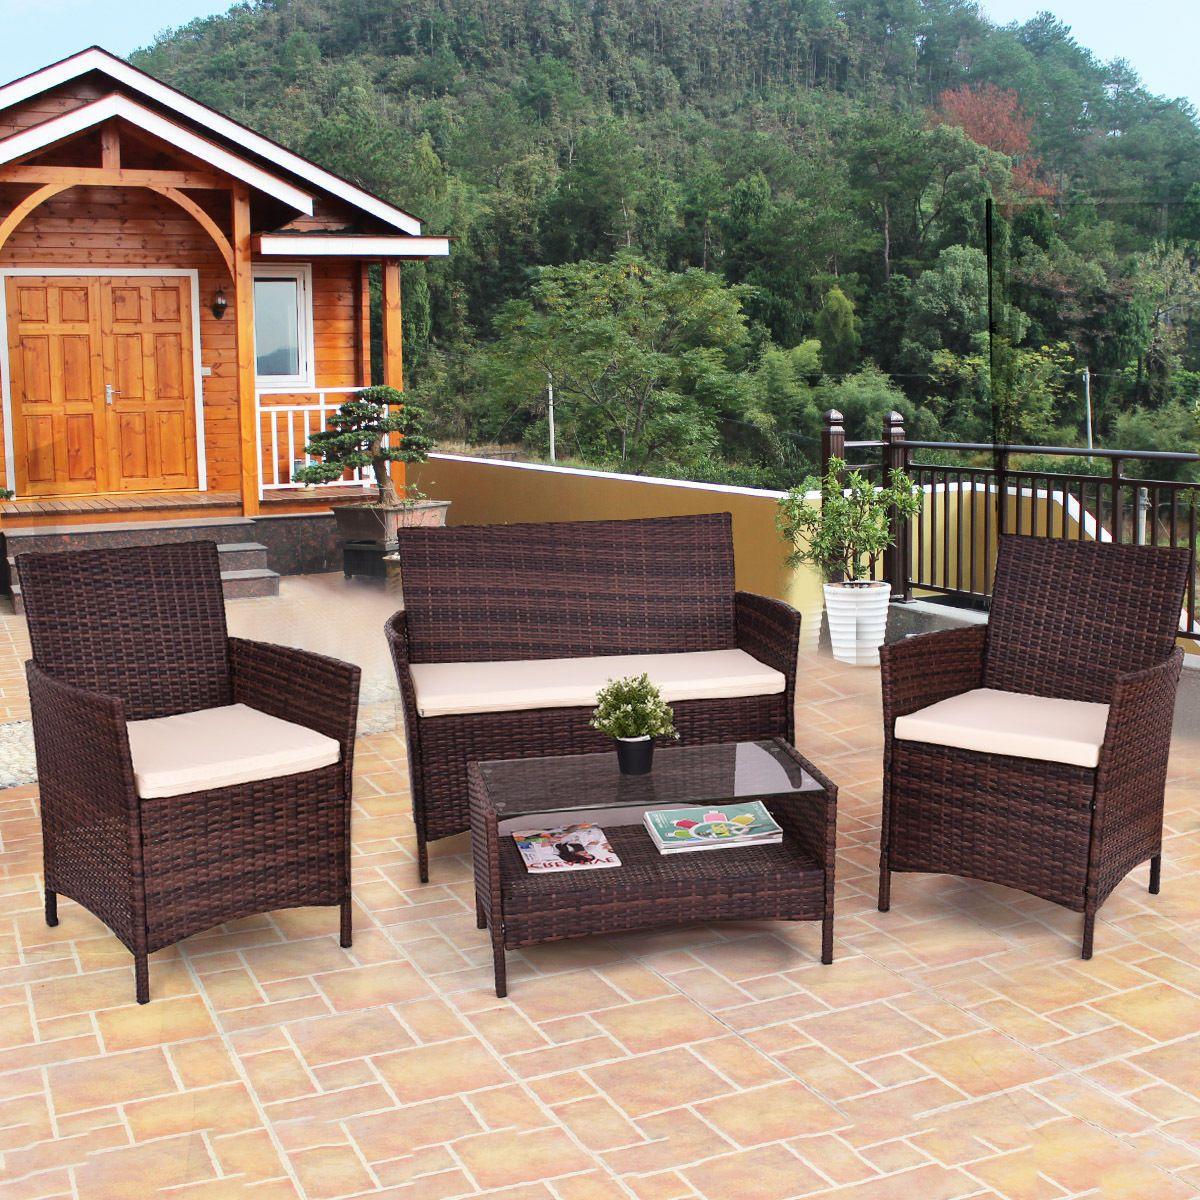 Gentil 4Pcs Outdoor Patio Pe Rattan Wicker Table Shelf Sofa Furniture Set With  Cushion